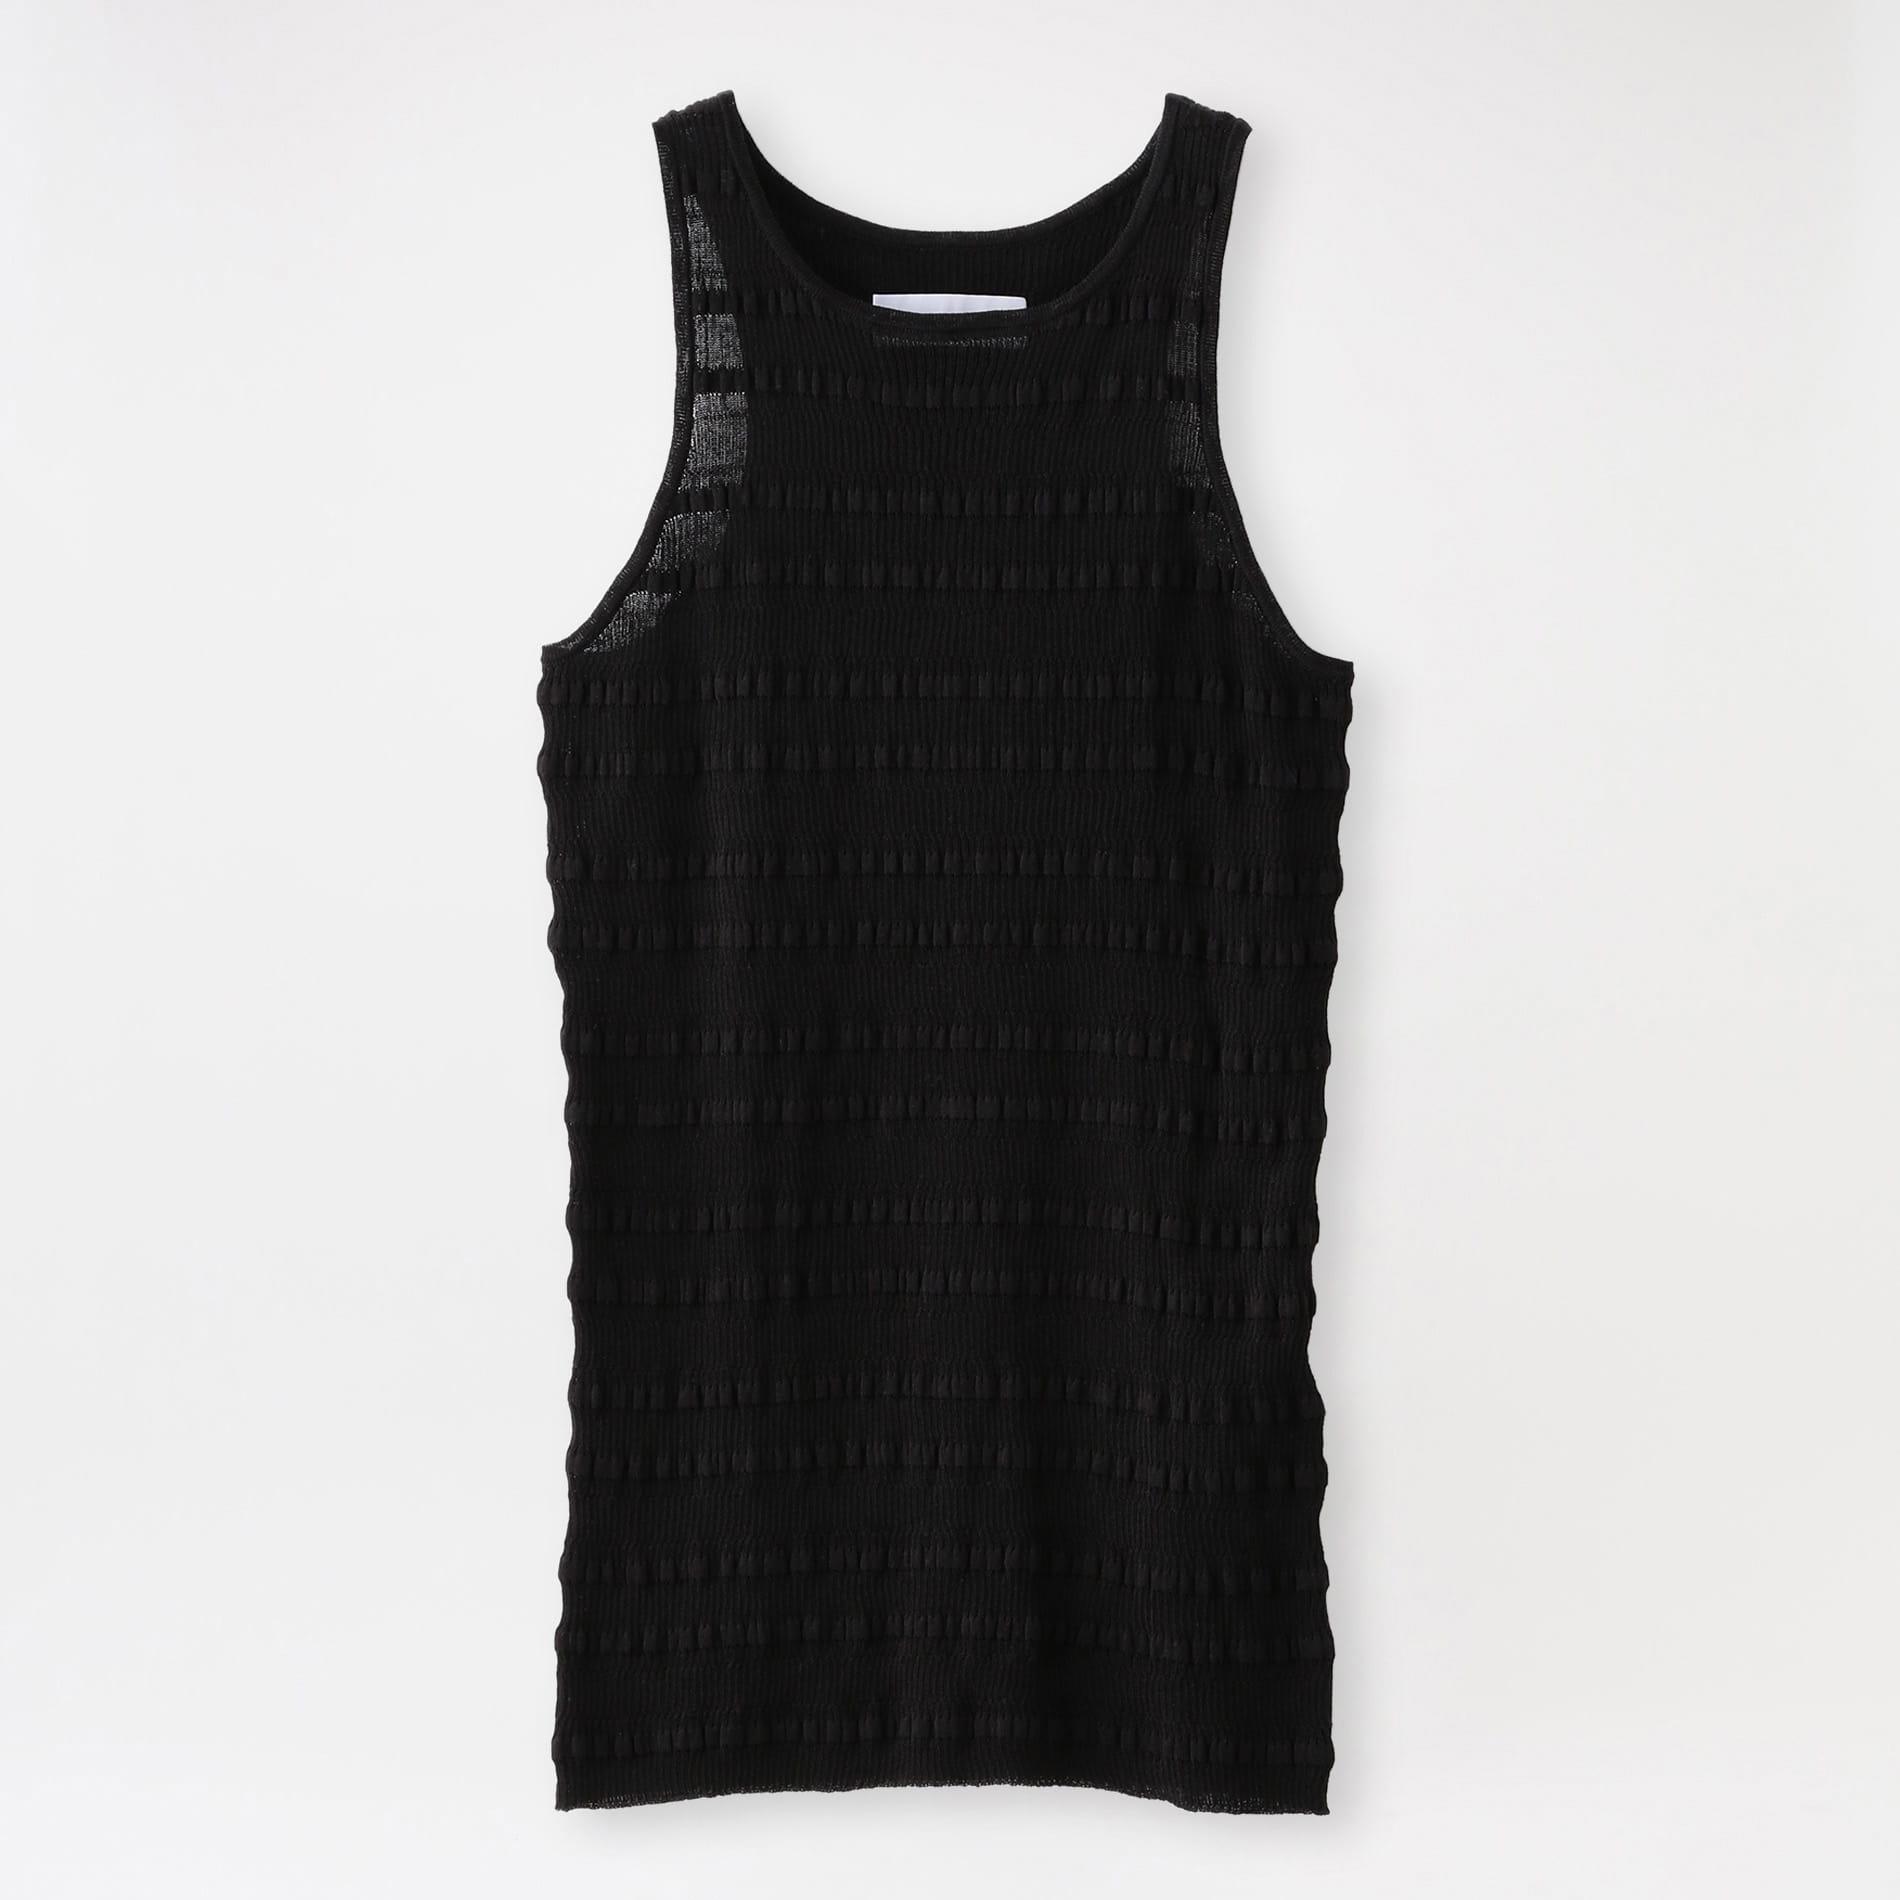 【SAYAKA DAVIS】WOMEN Knit Tanktop MKT105-BC